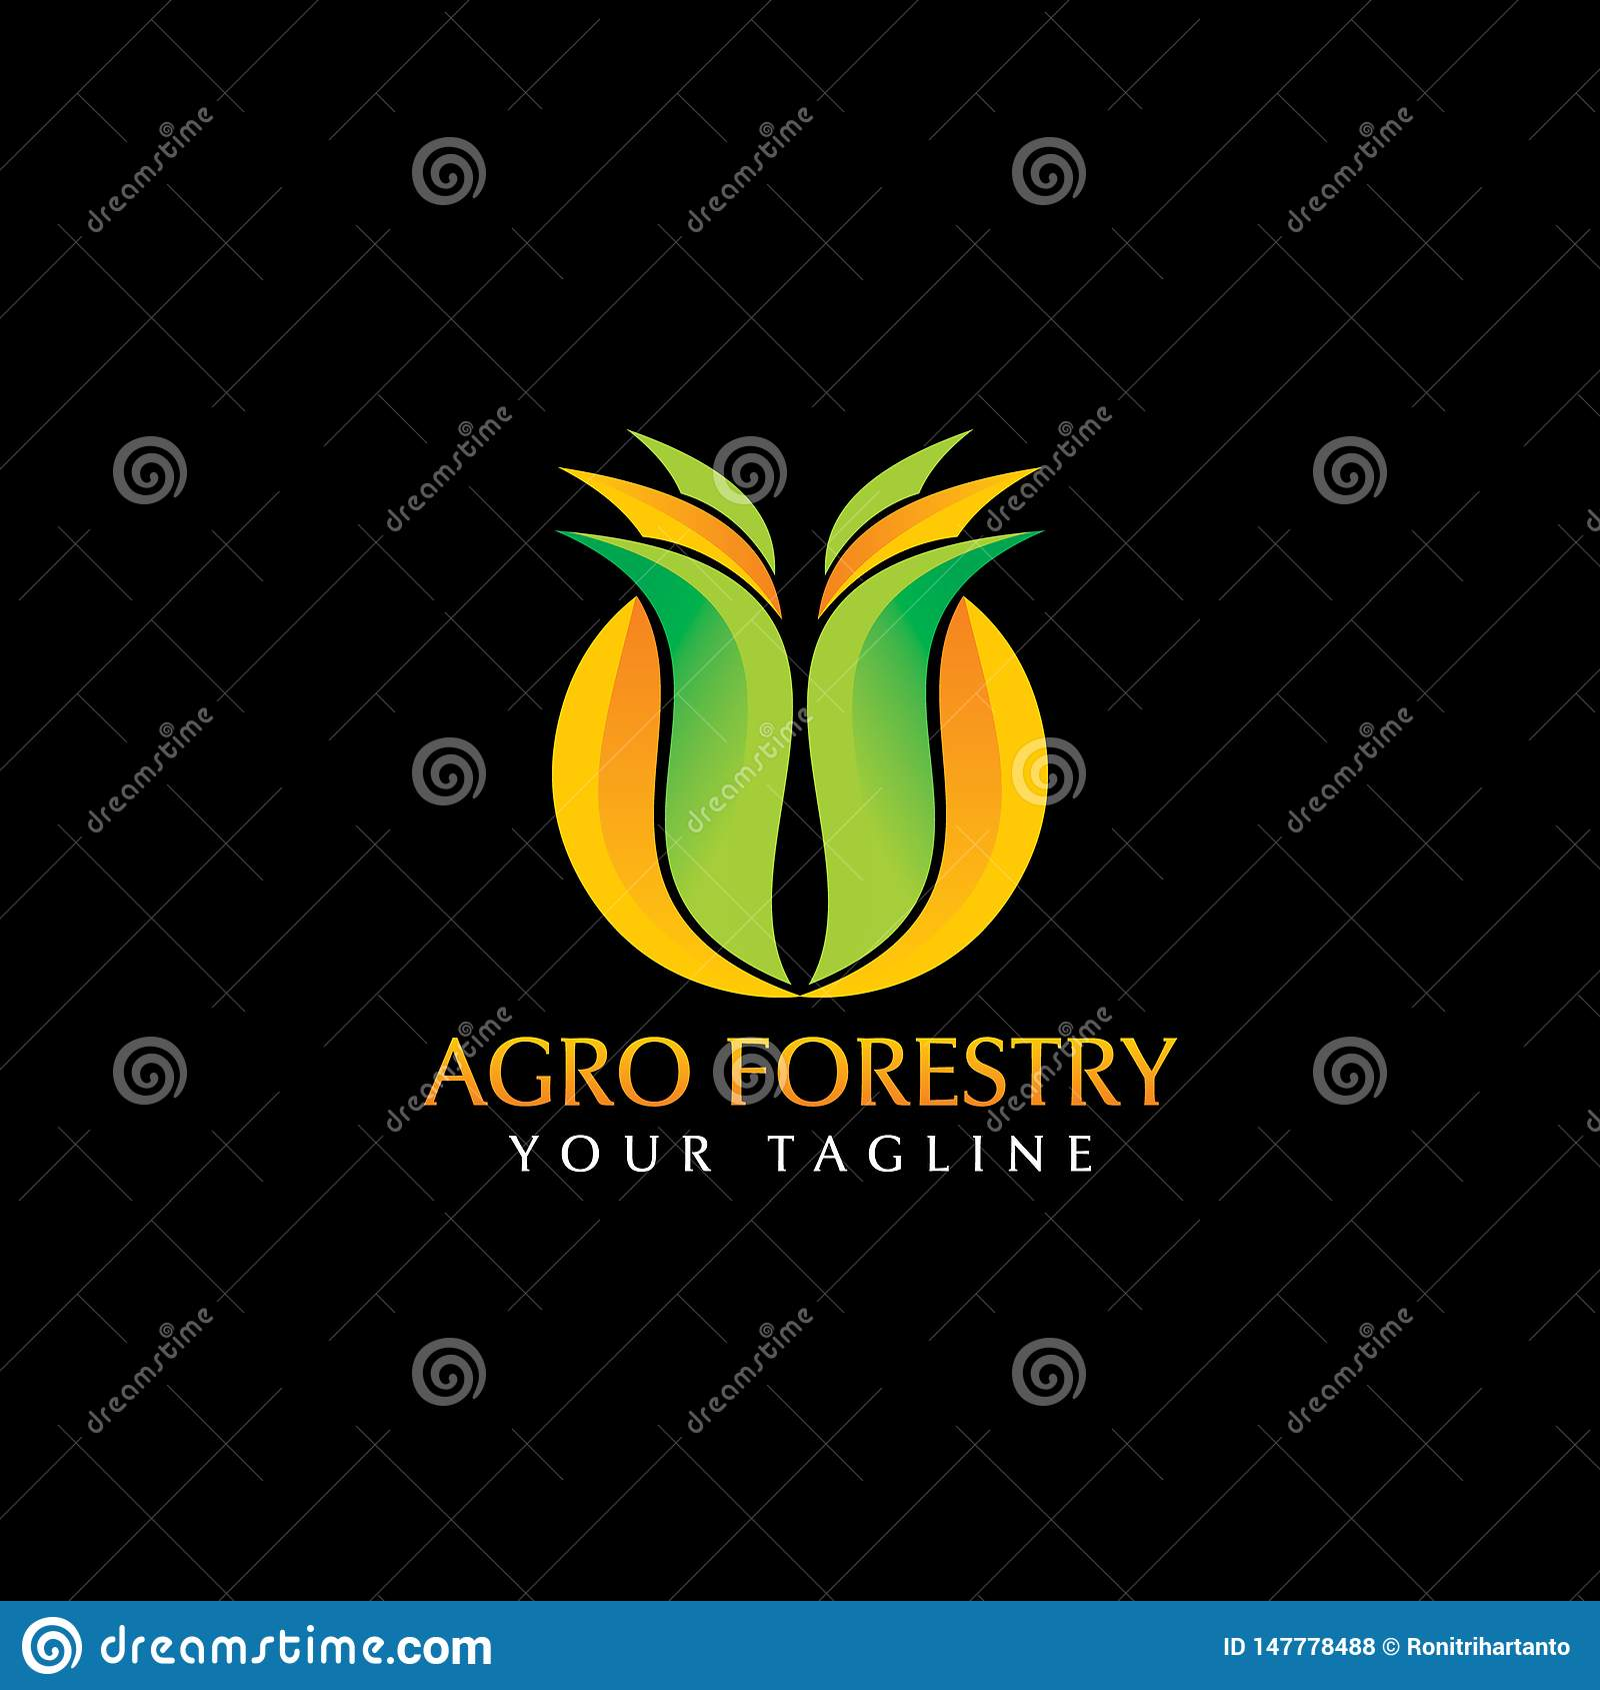 Agro skogsbrukLogo Design inspiration